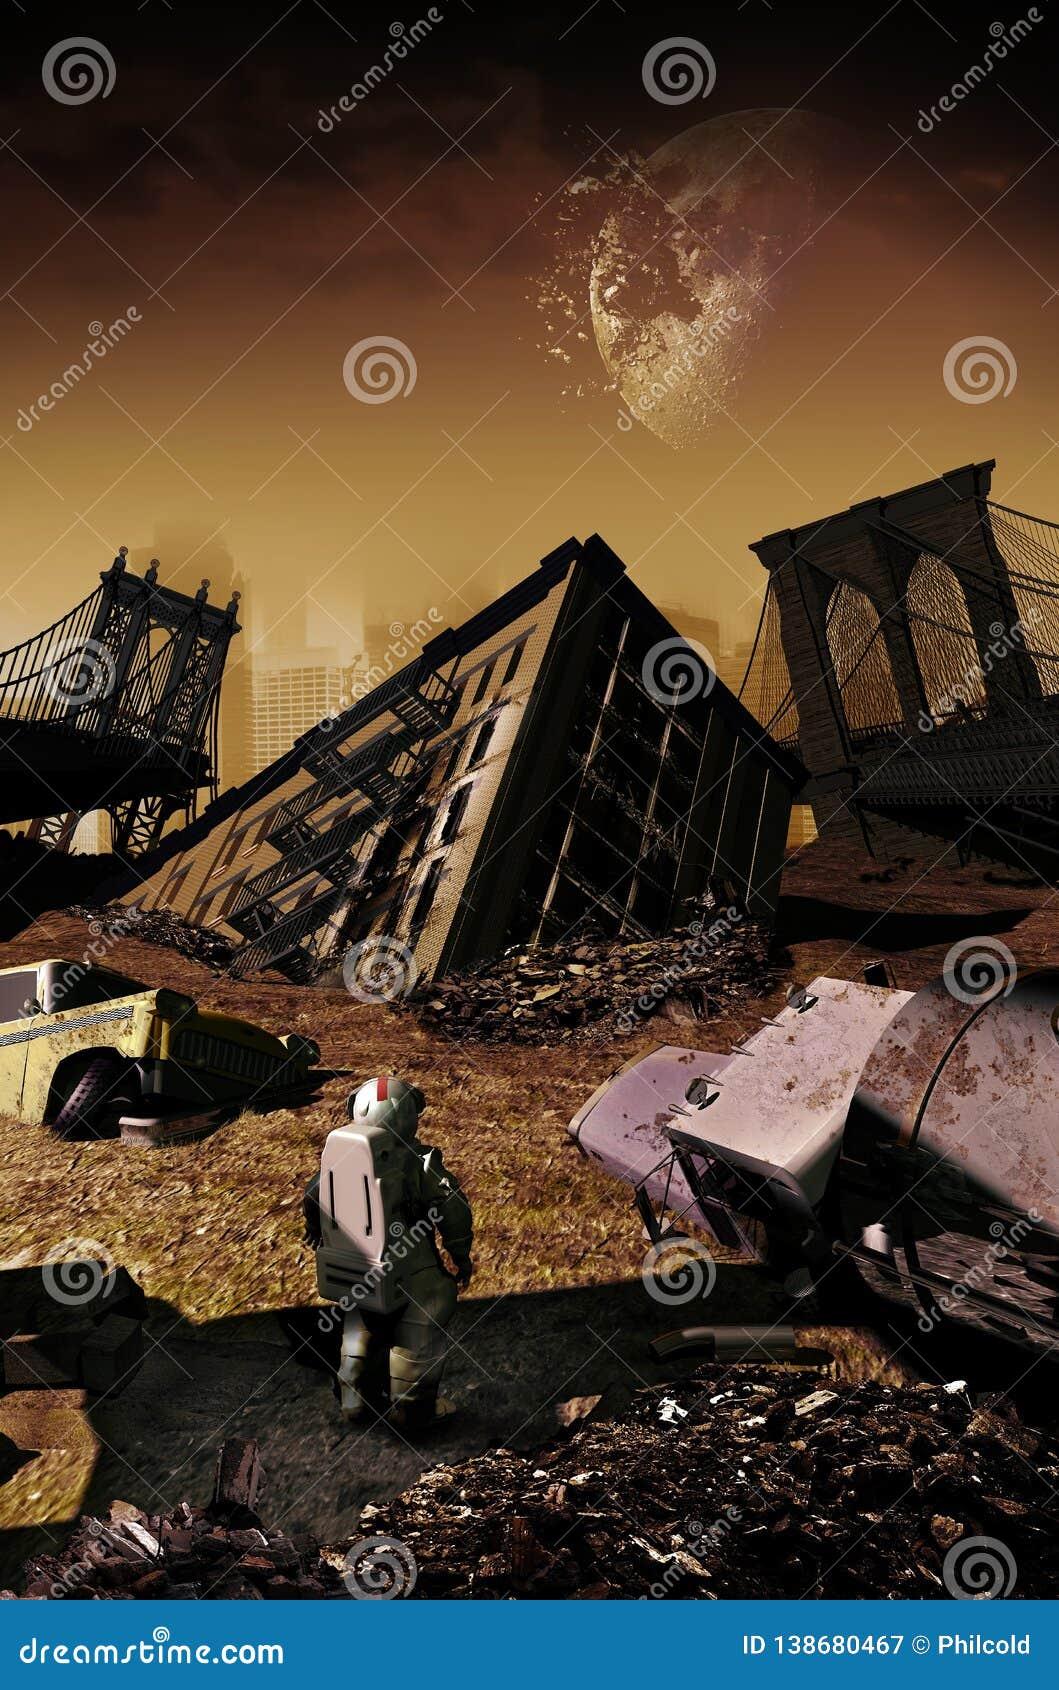 Dark and Apocalyptic Future